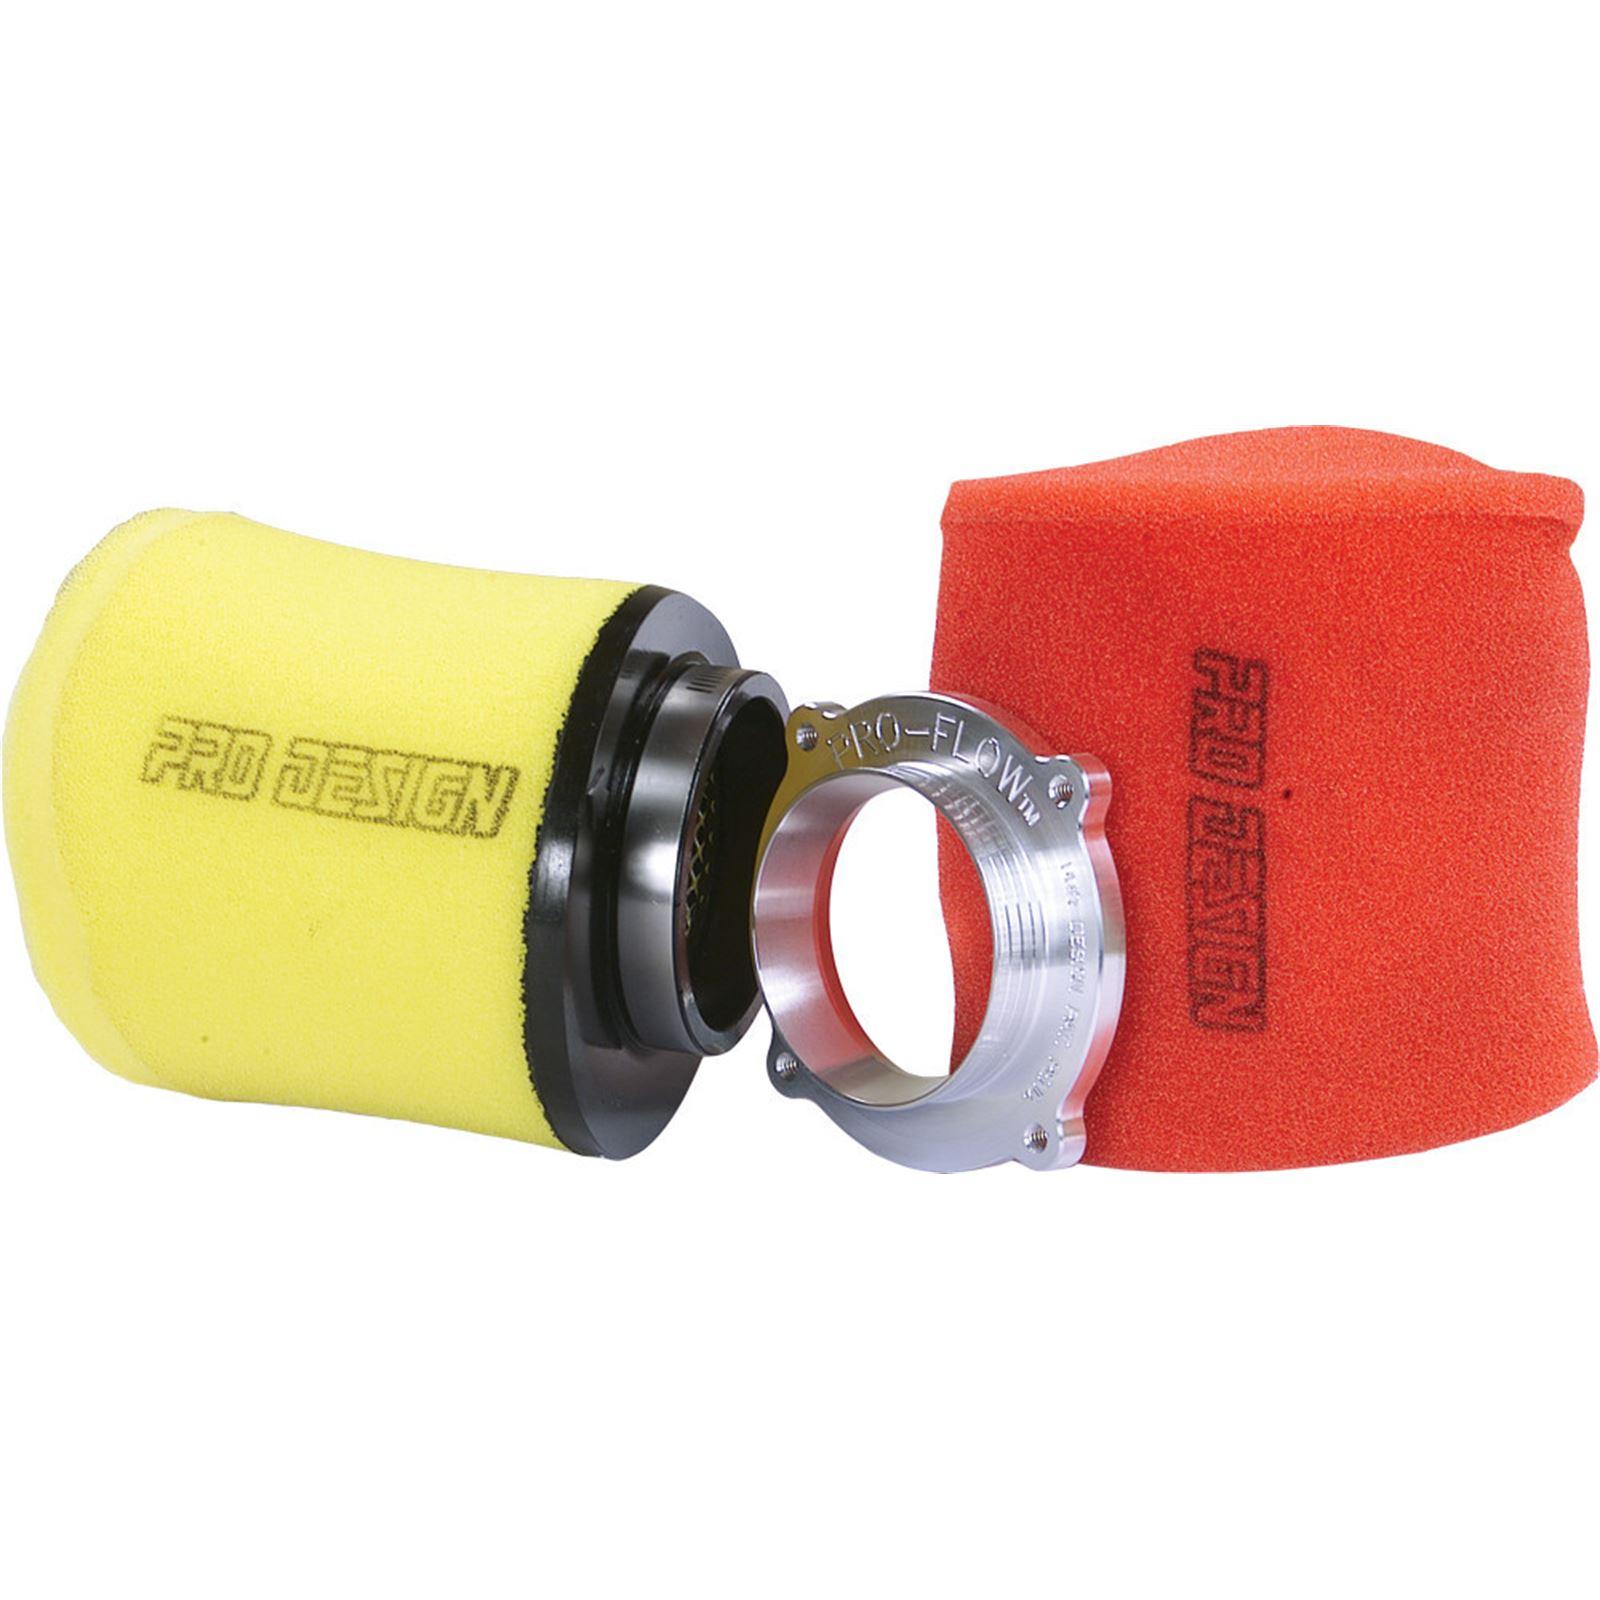 Pro Design Pro Flow Air Filter Foam Kit